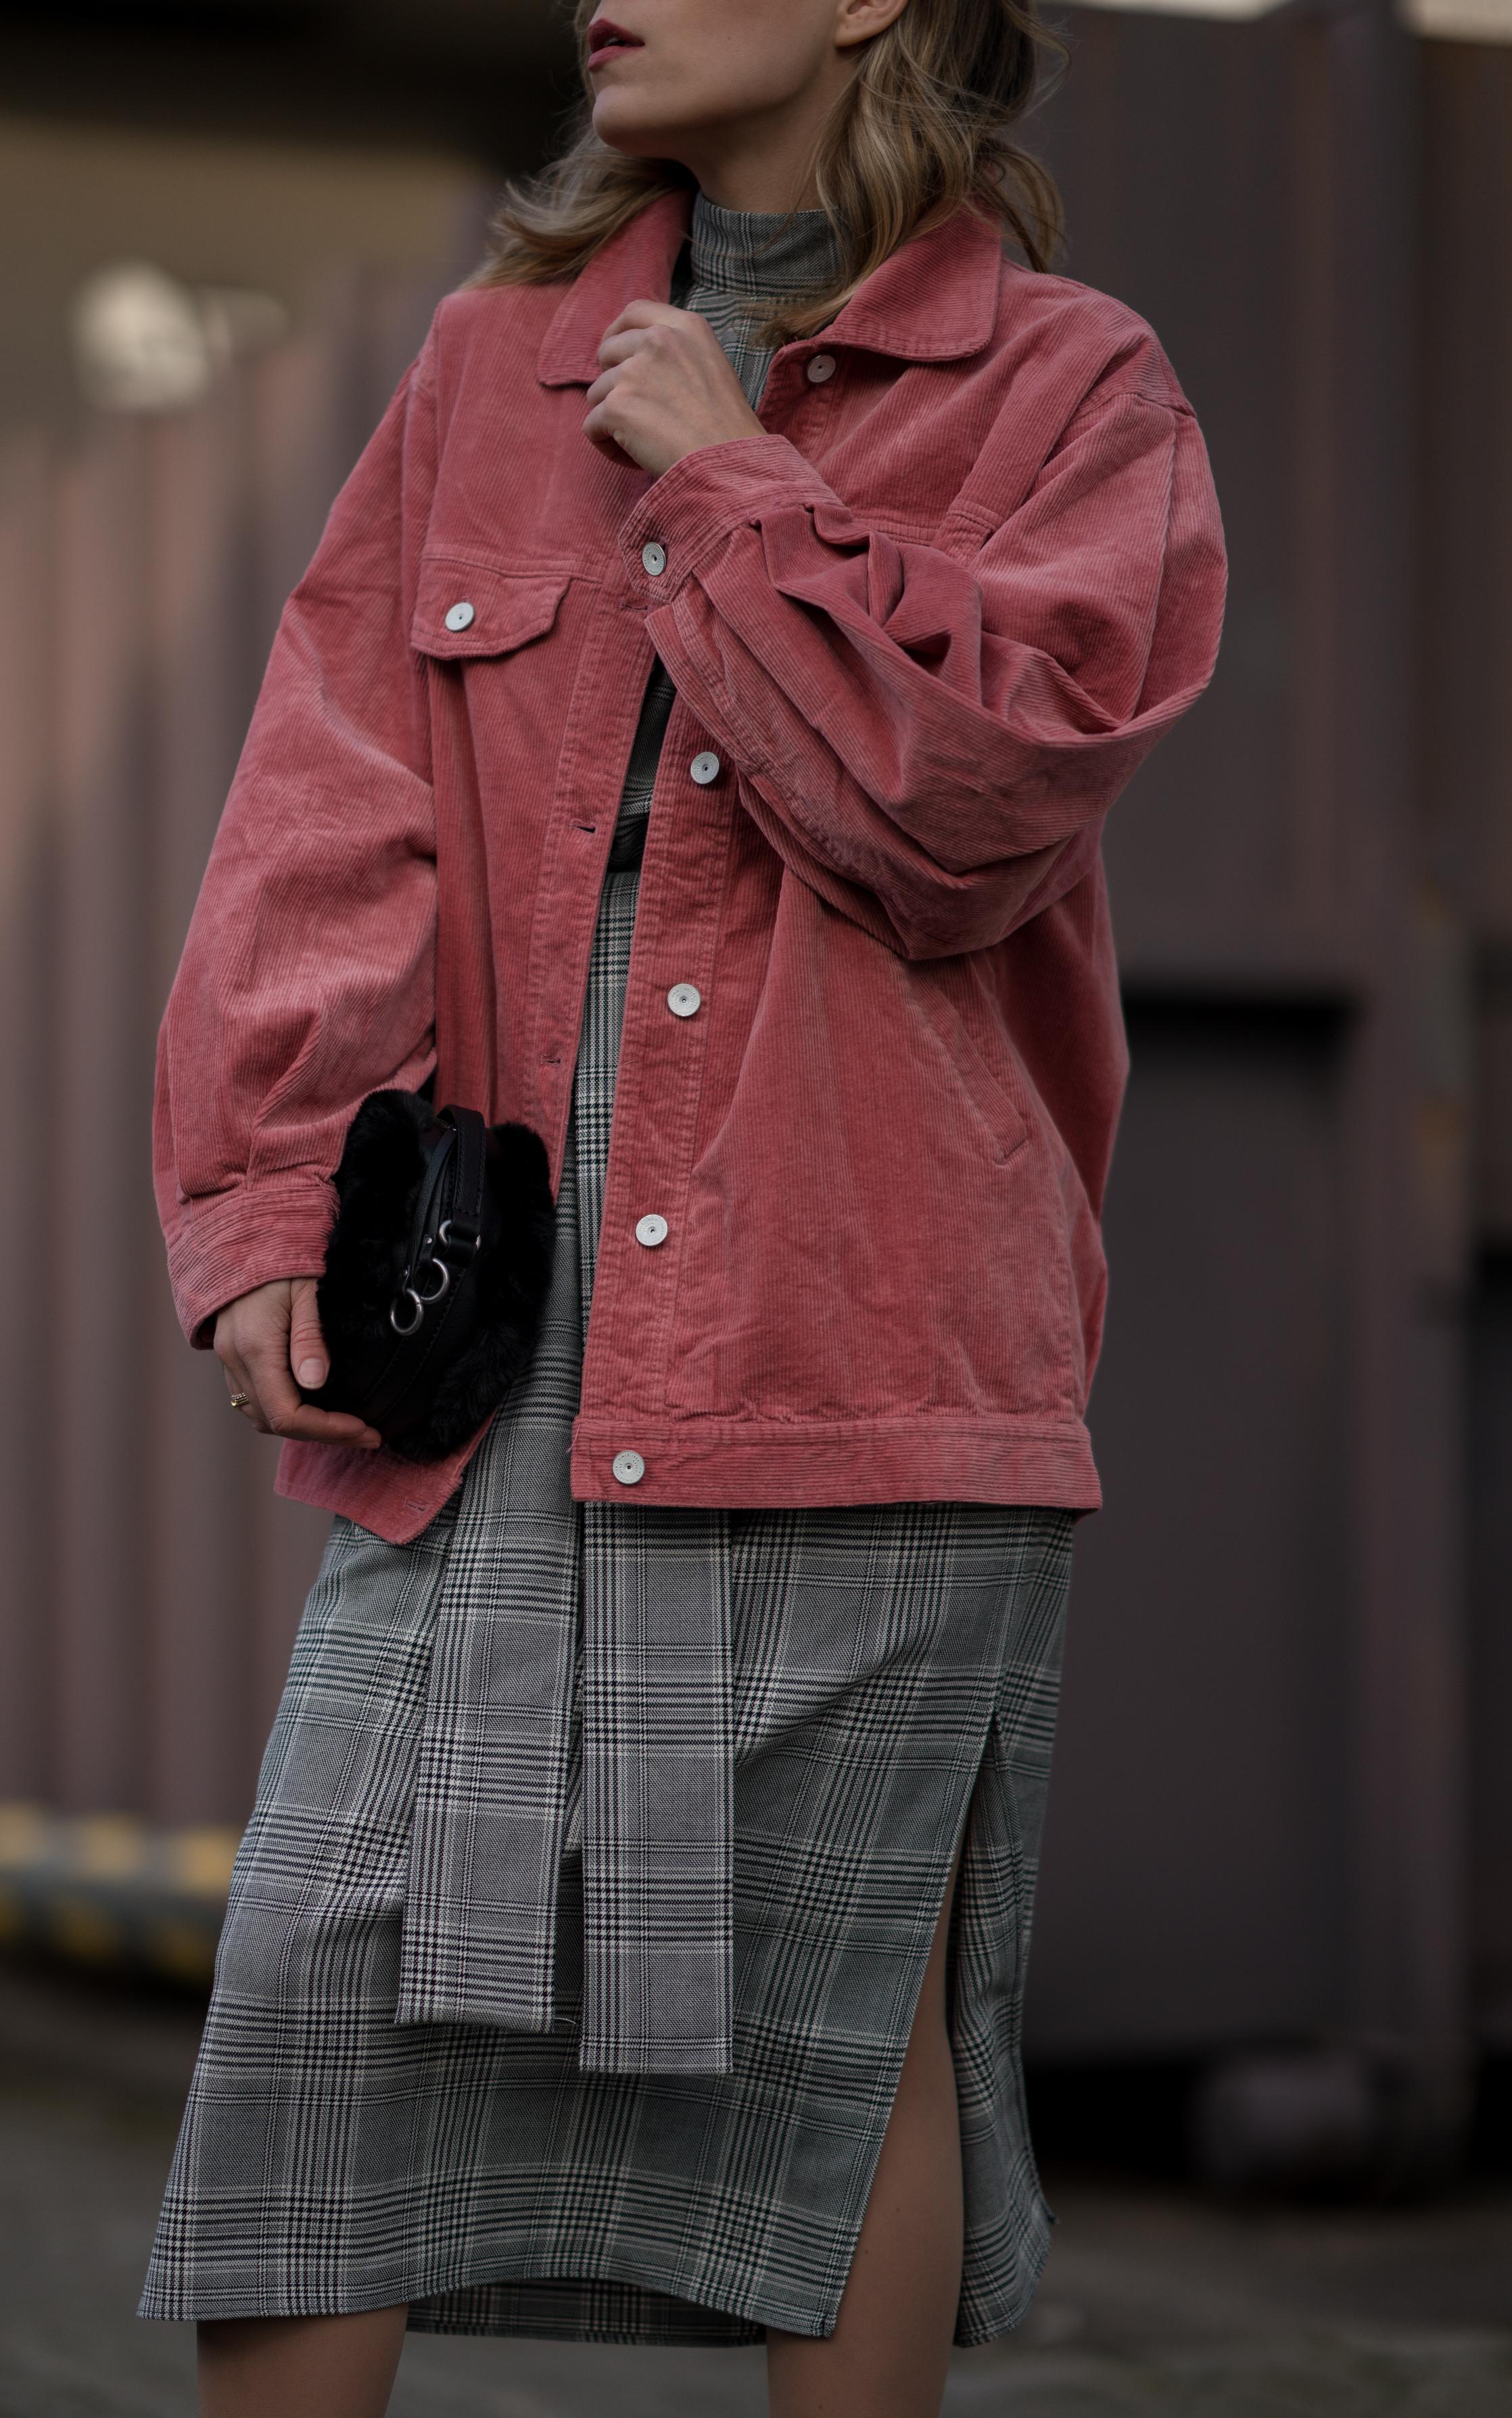 Pink Cord Jacket Glencheck Dress White Sneakers oversize Mango Cordjacke kariertes Kleid Zara Cord Trend Streetstyle Modeblog Sariety Fashionblogger Heidelberg_8